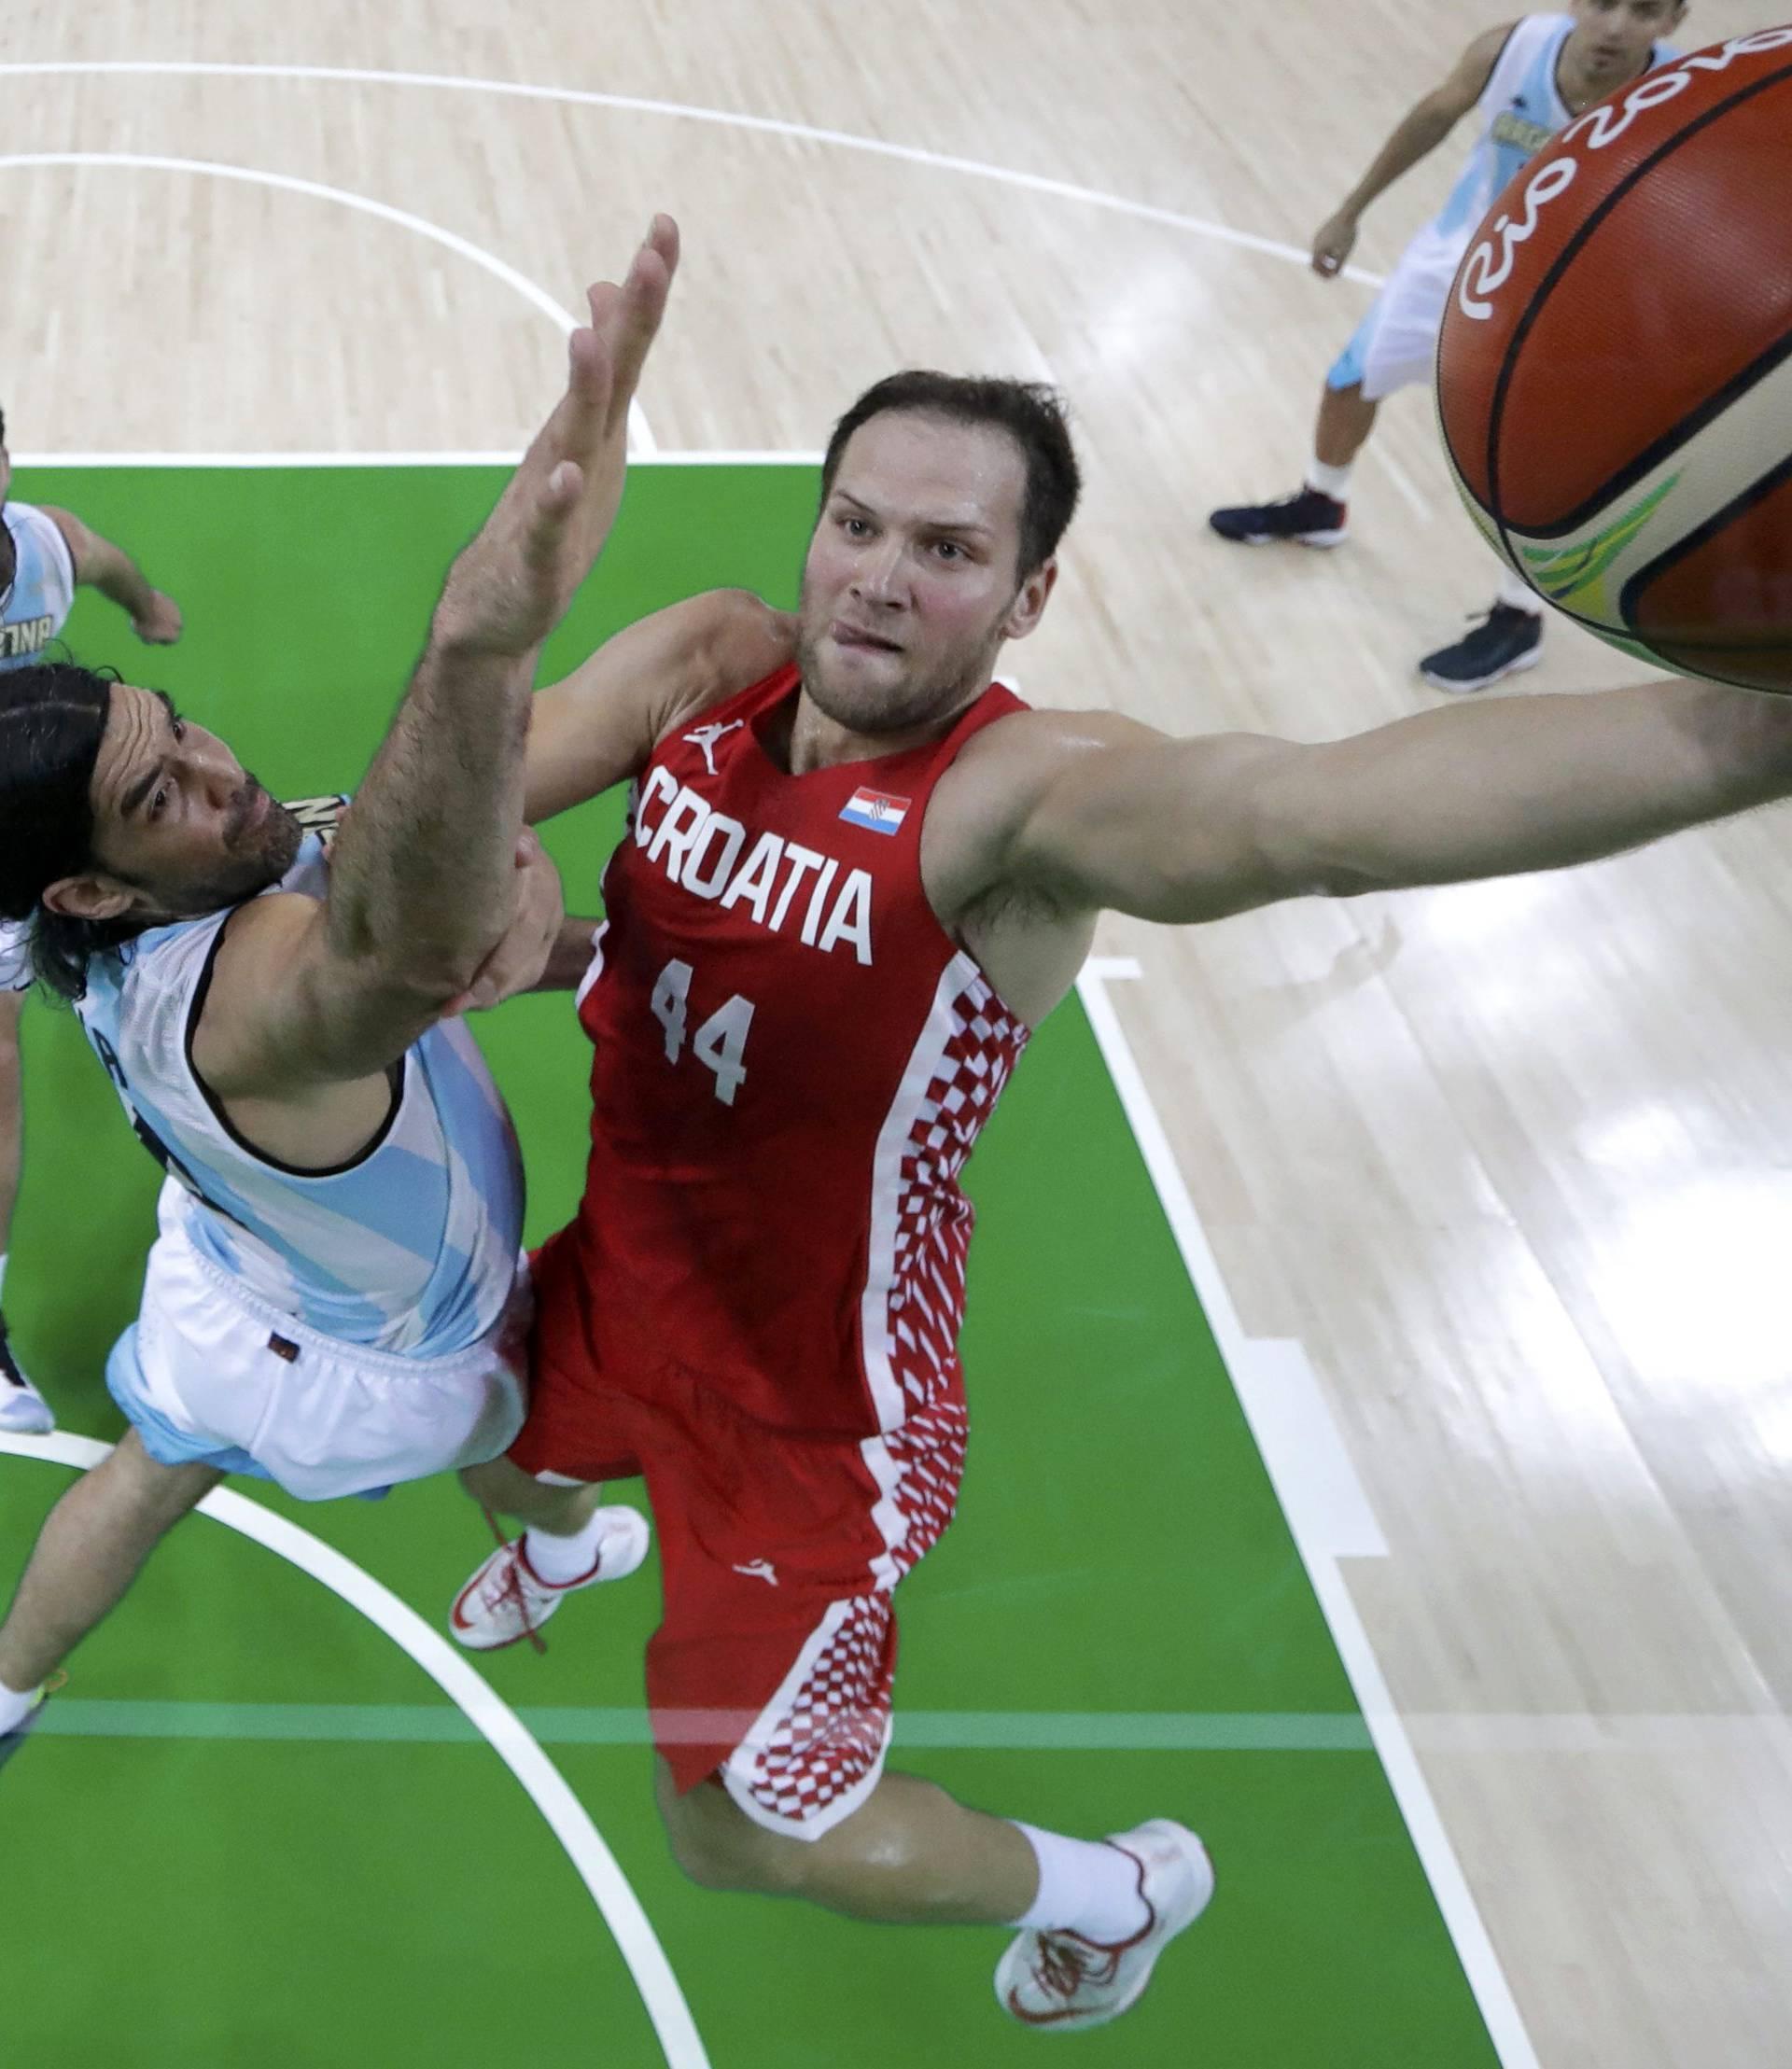 Basketball - Men's Preliminary Round Group B Argentina v Croatia